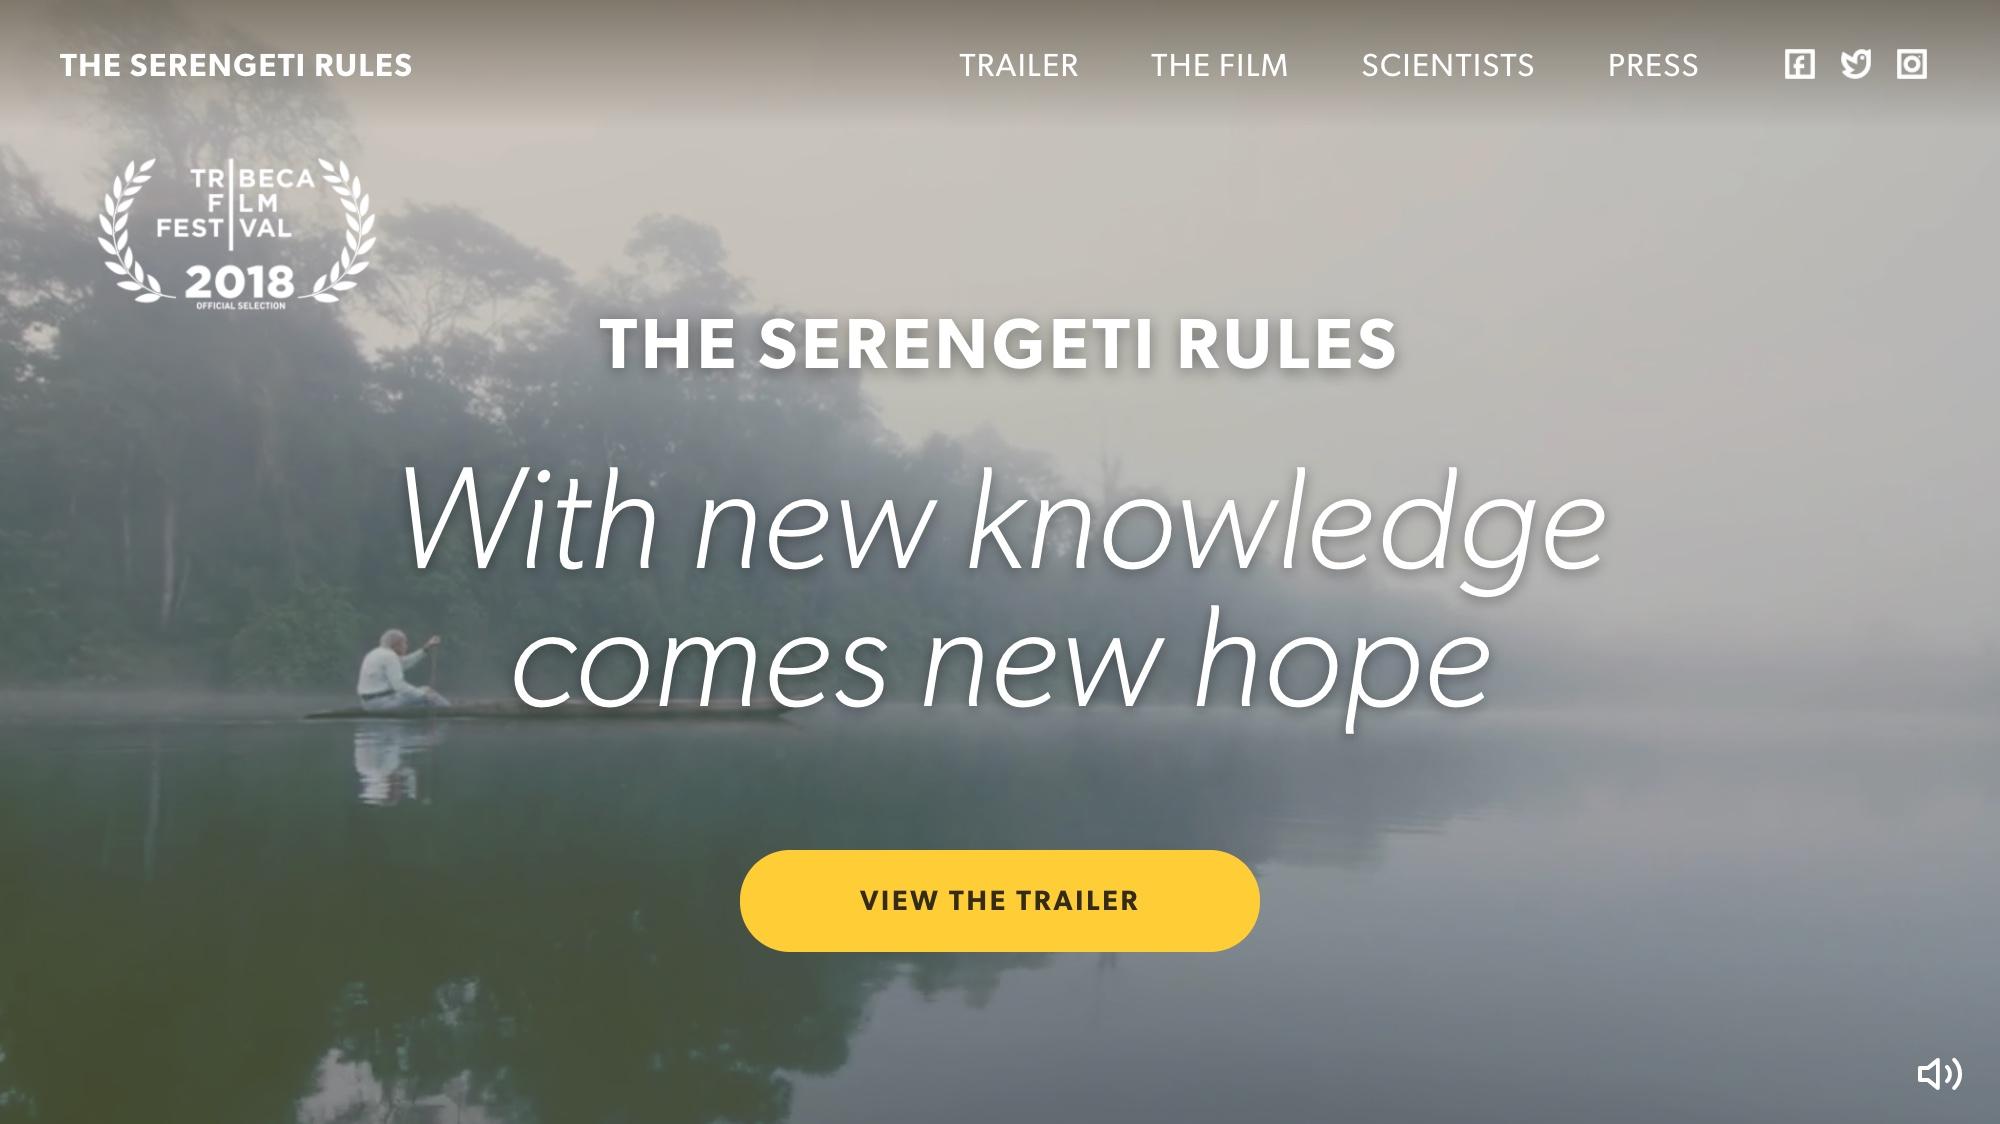 www.theserengetirules.com